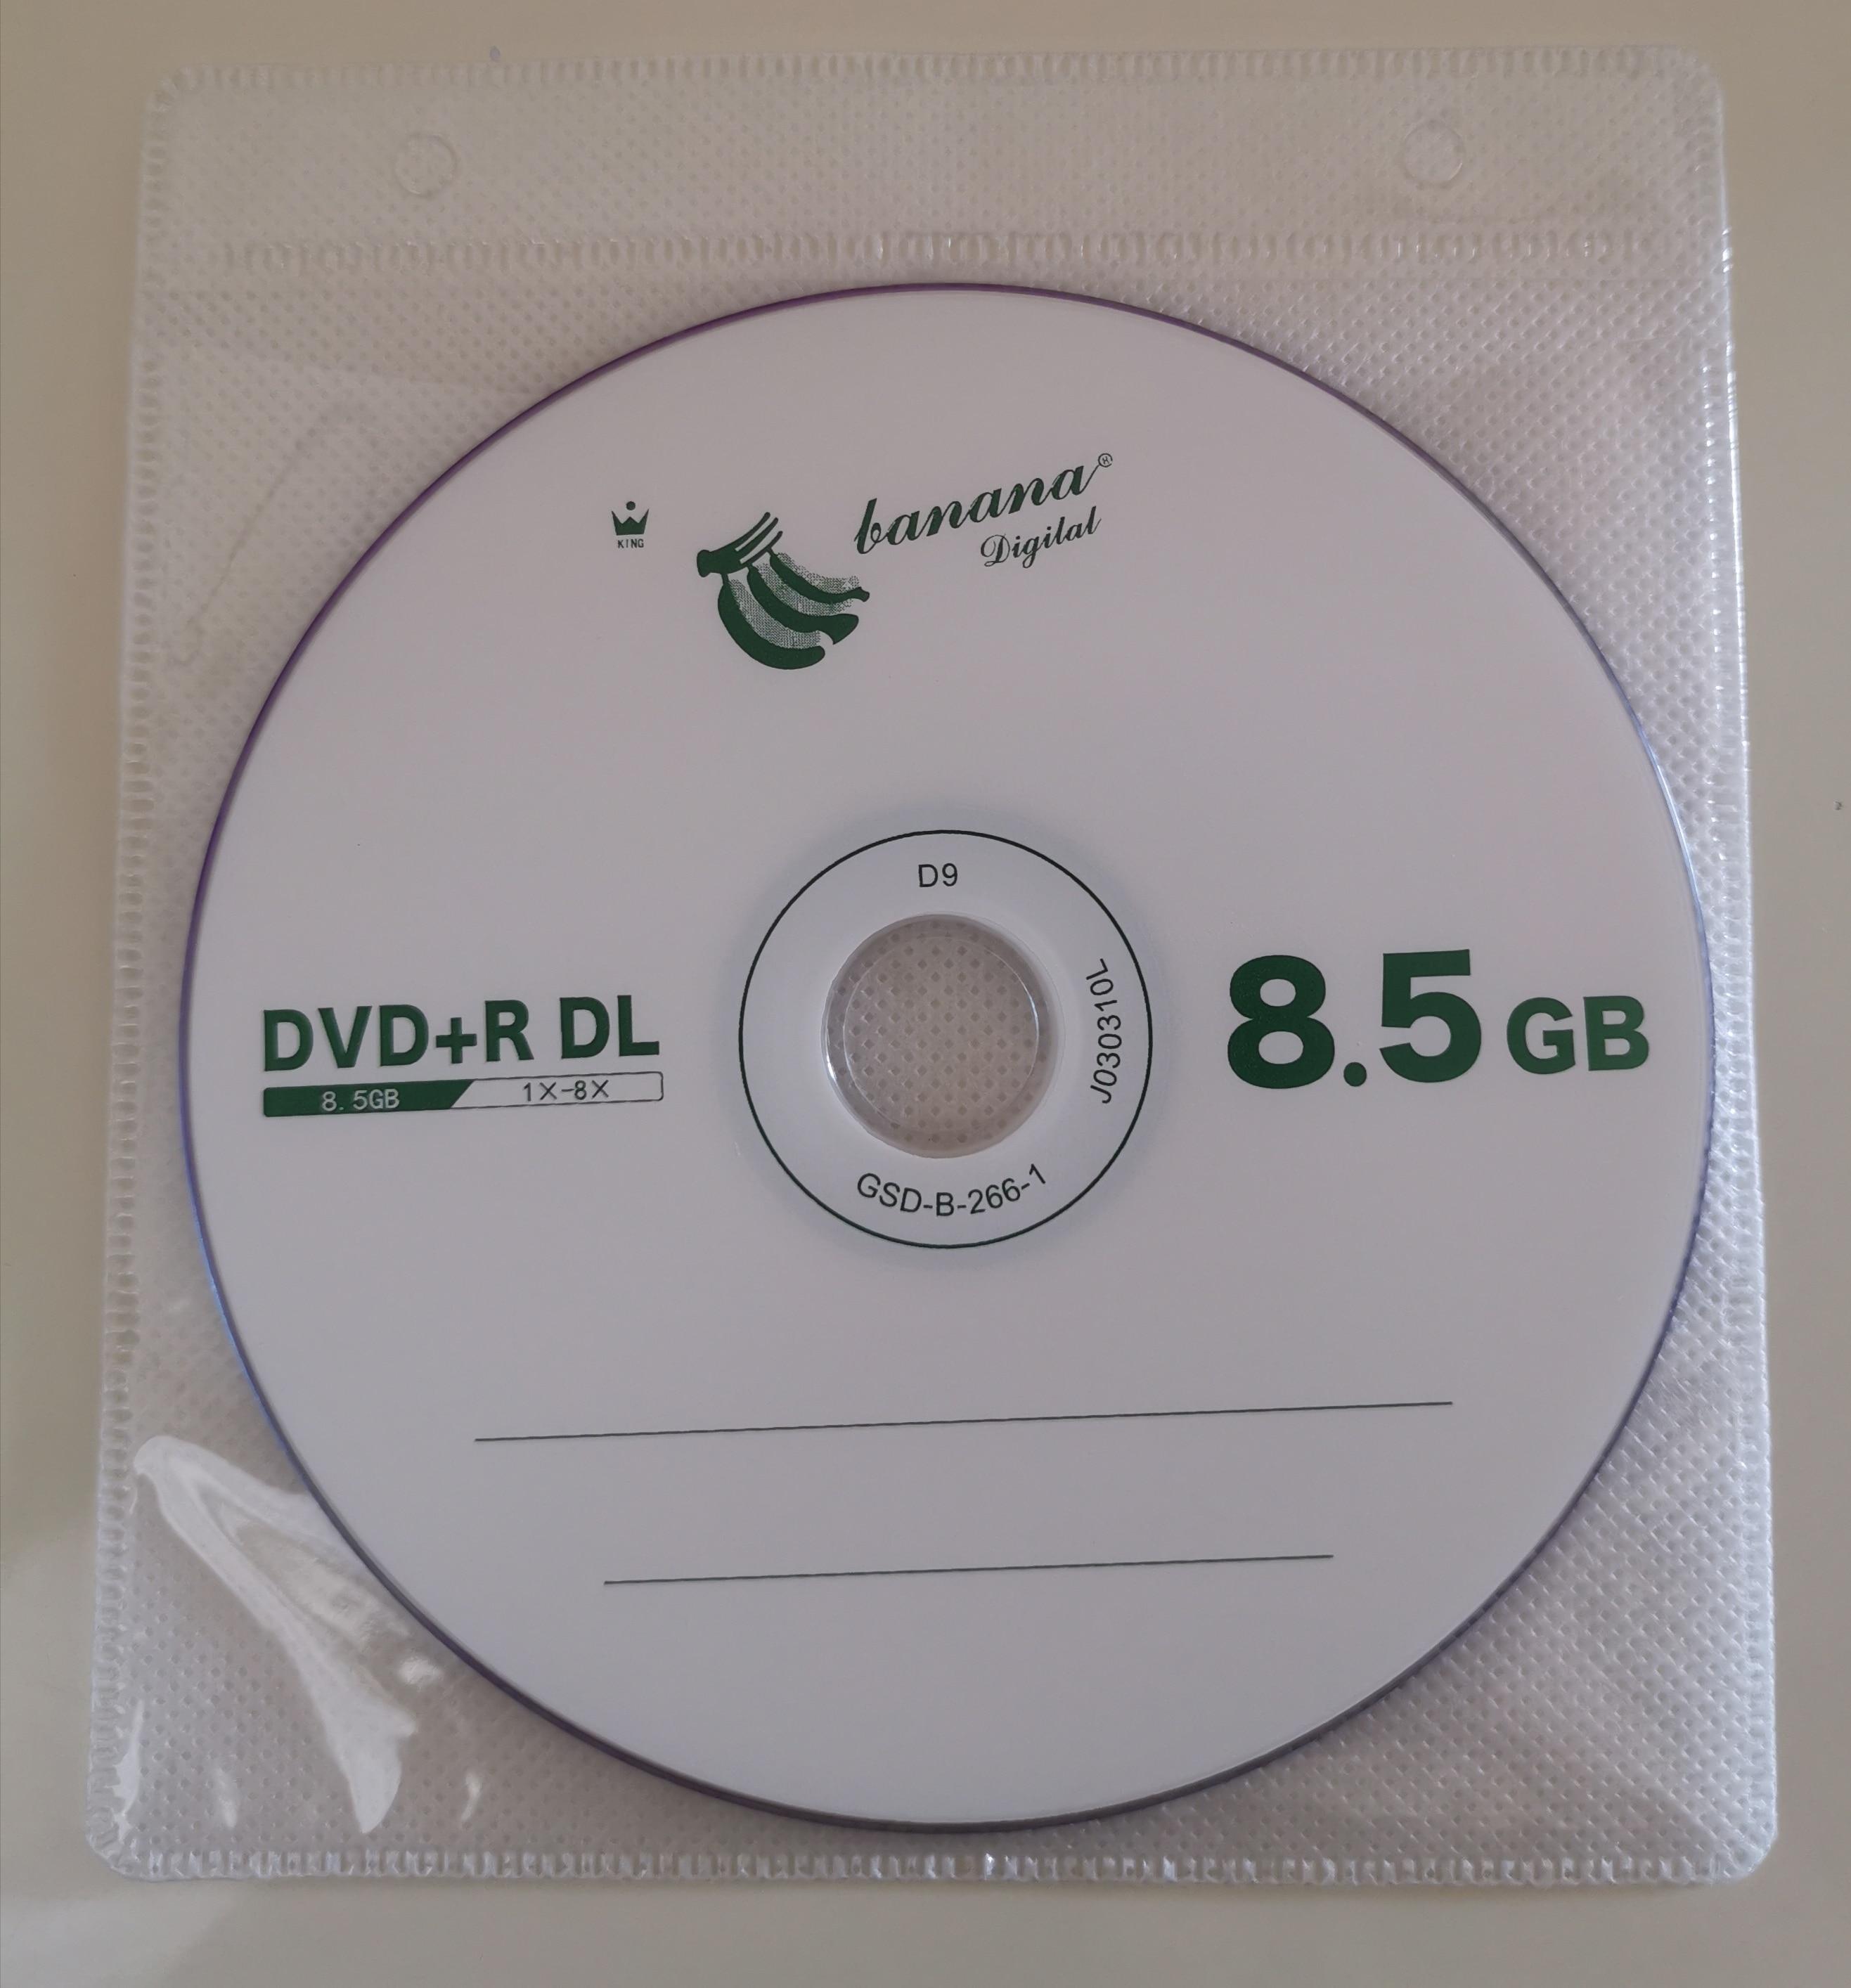 Wholesale DVD+R DL 8.5GB Dual Layer D9 8X 240min 10pcs/lot Free Shipping